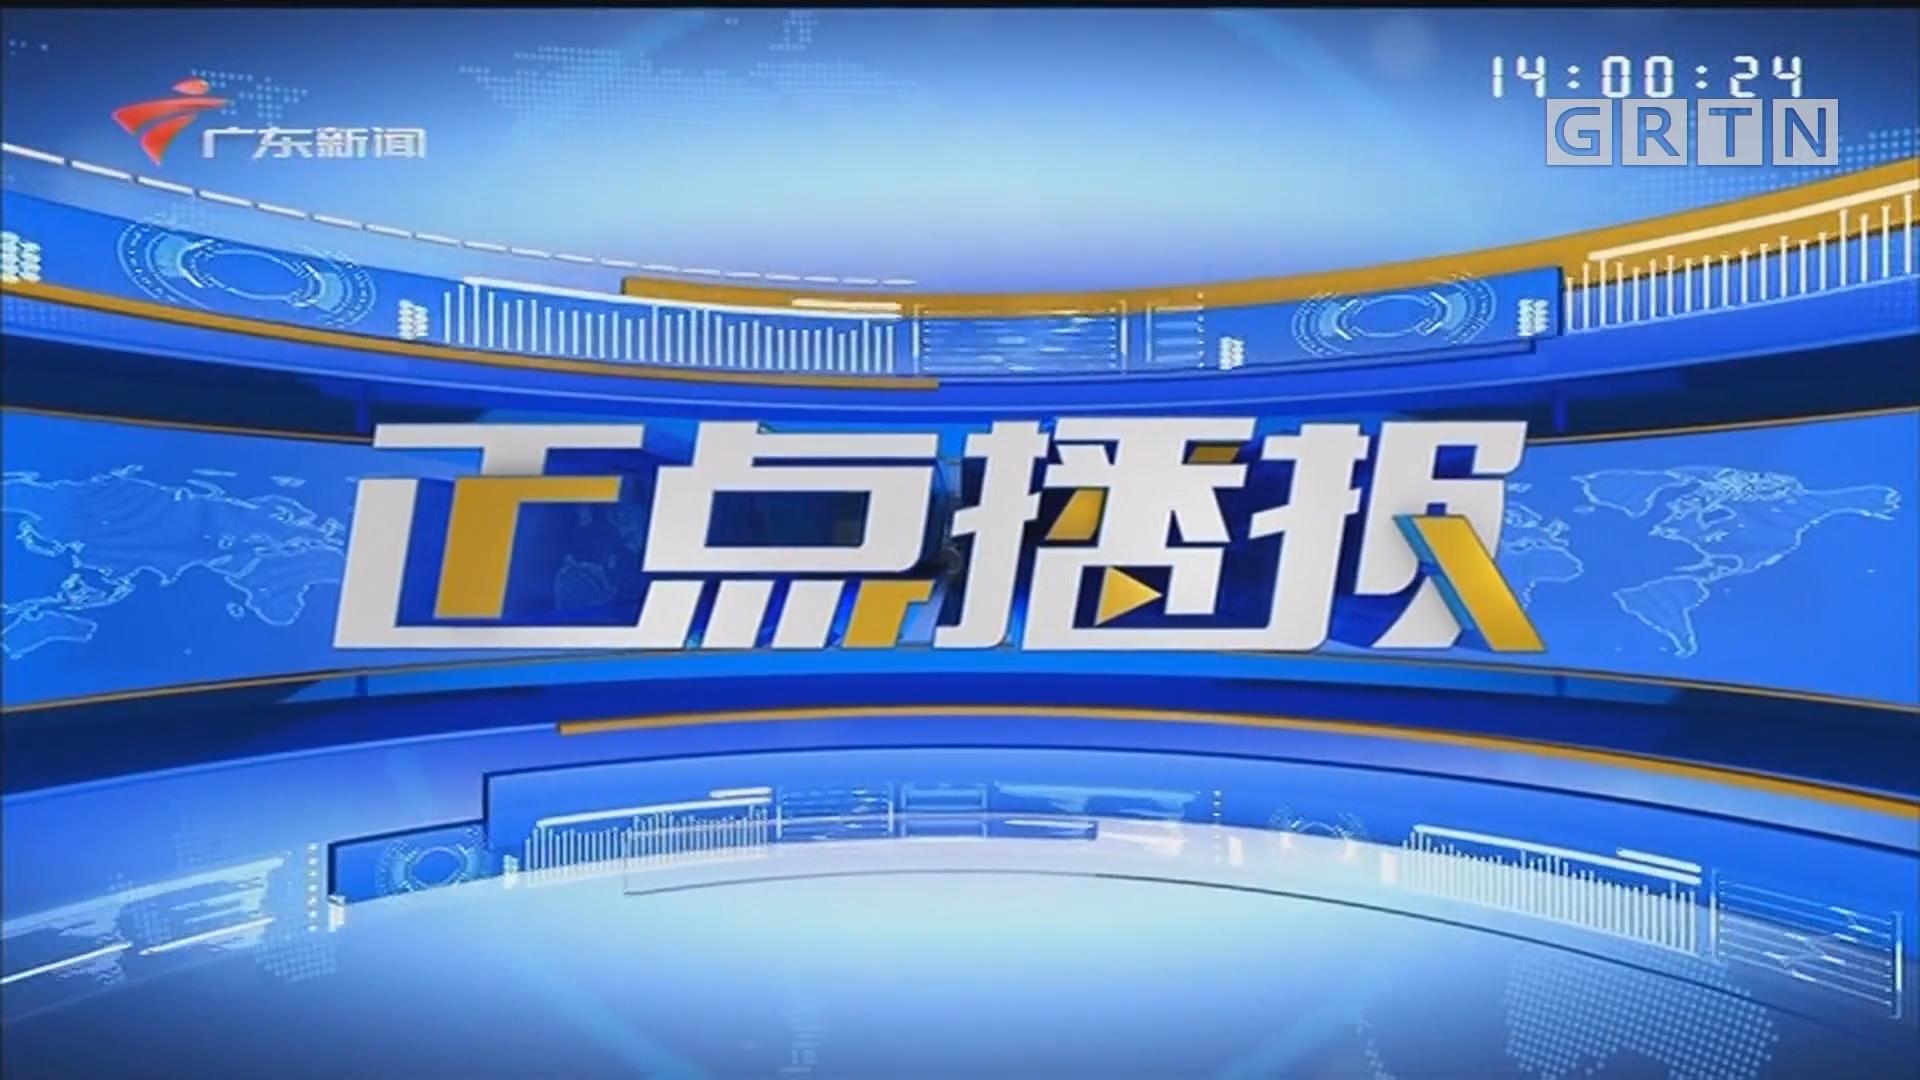 [HD][2020-06-04-14:00]正点播报:海南:11个自贸港重点园区挂牌